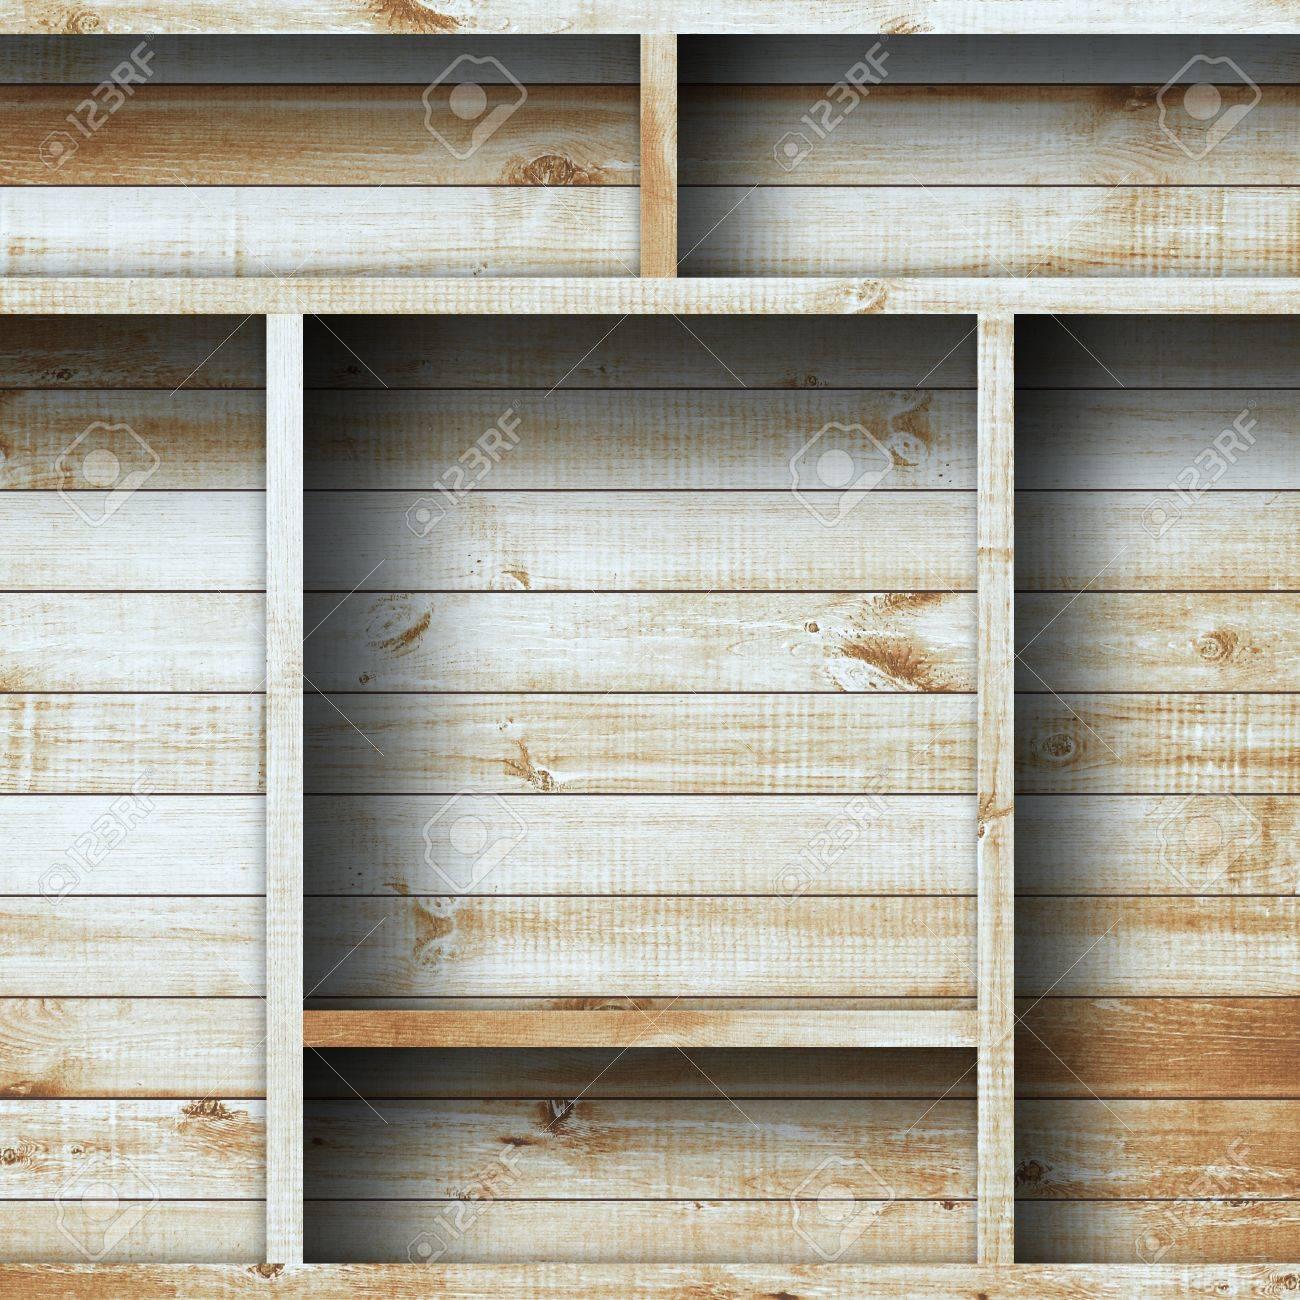 Empty wood shelf grunge industrial interior Uneven diffuse lighting